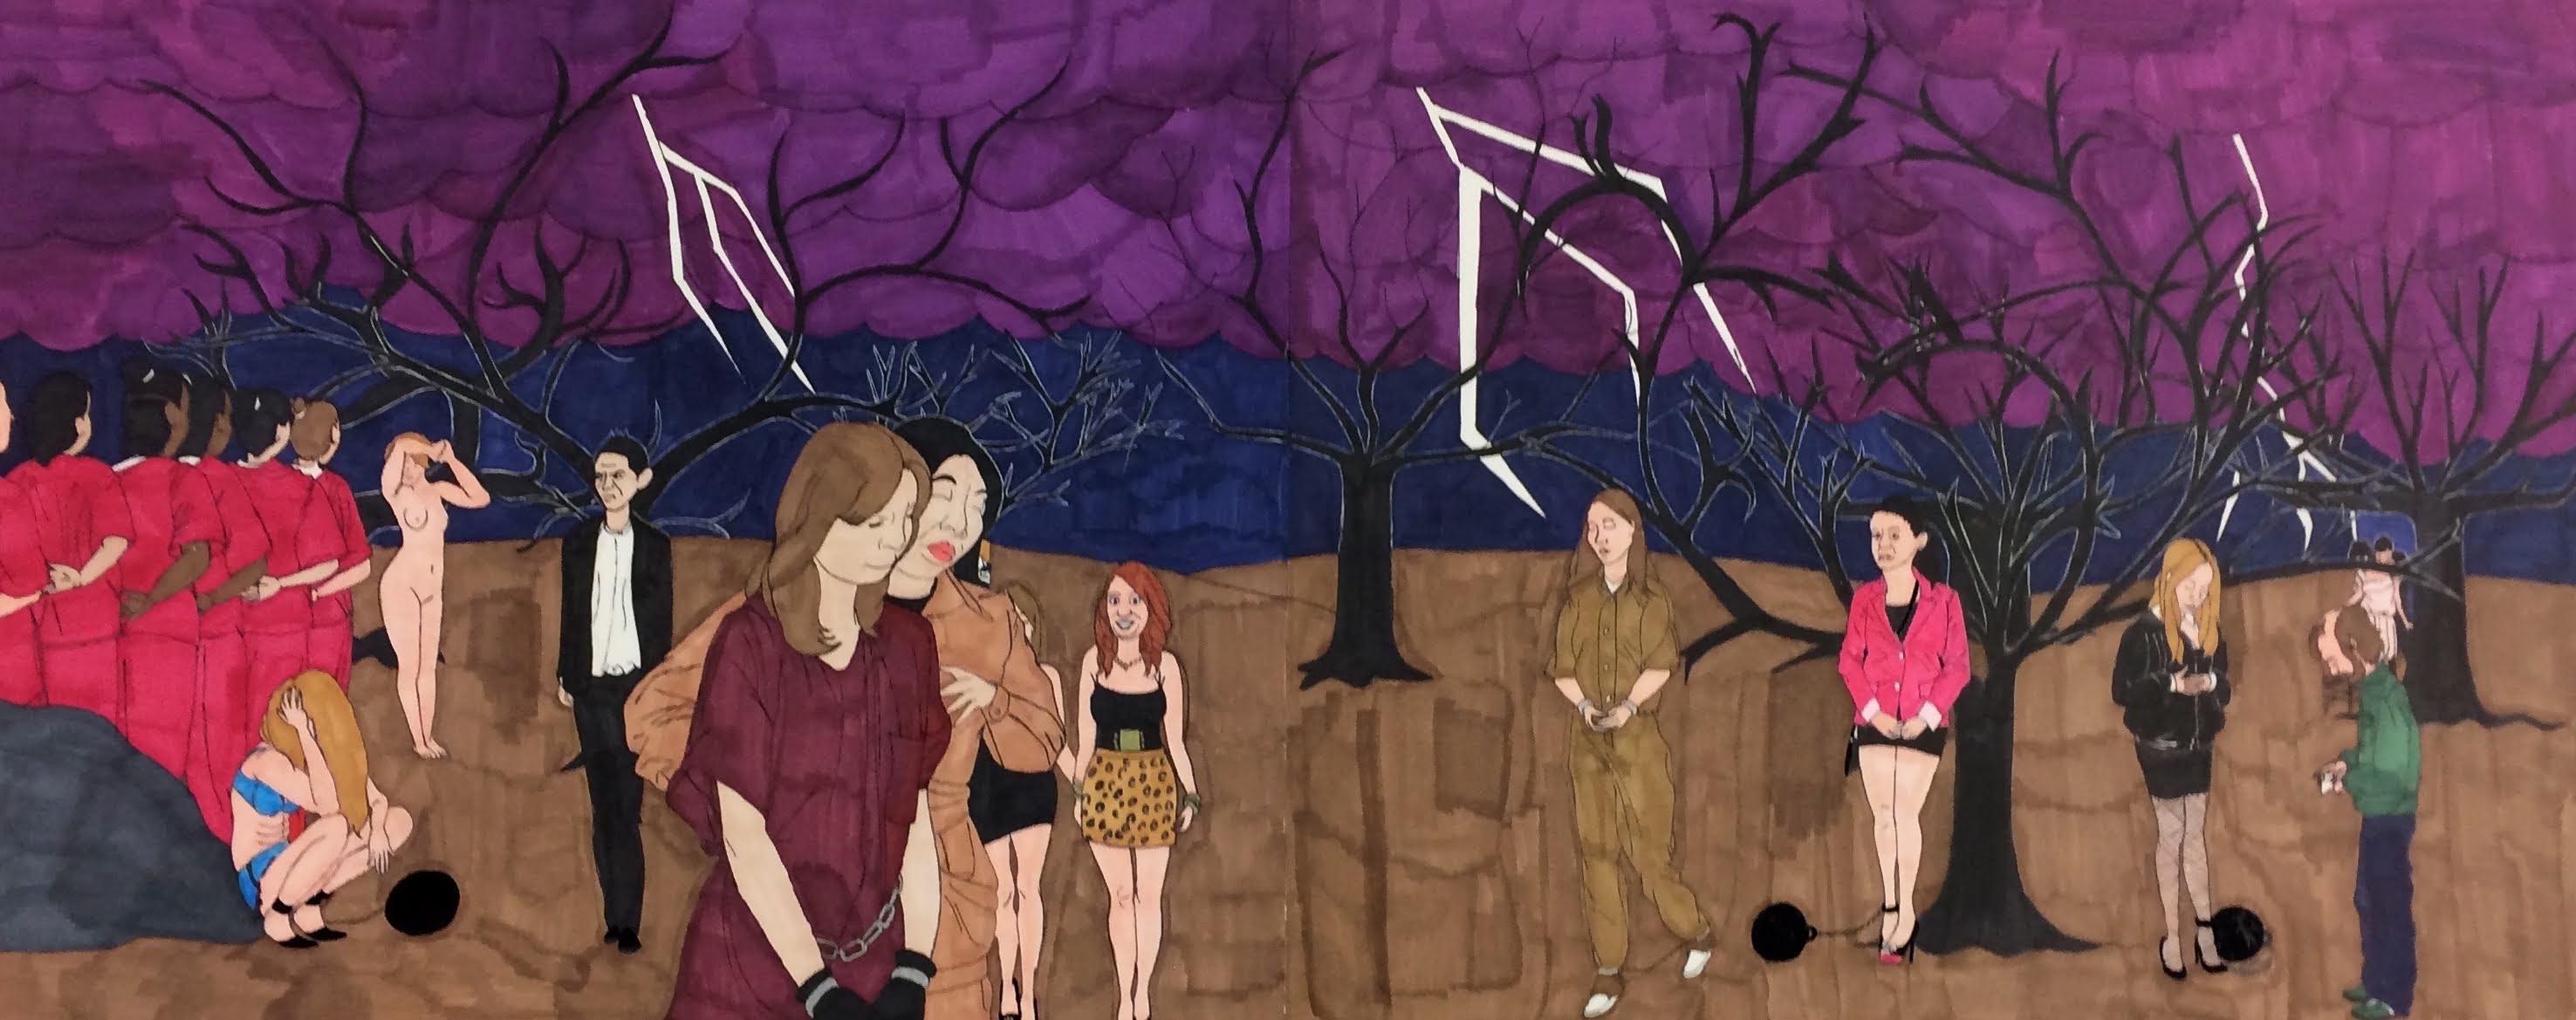 """Prostitution"" by Jacqueline Oliva"